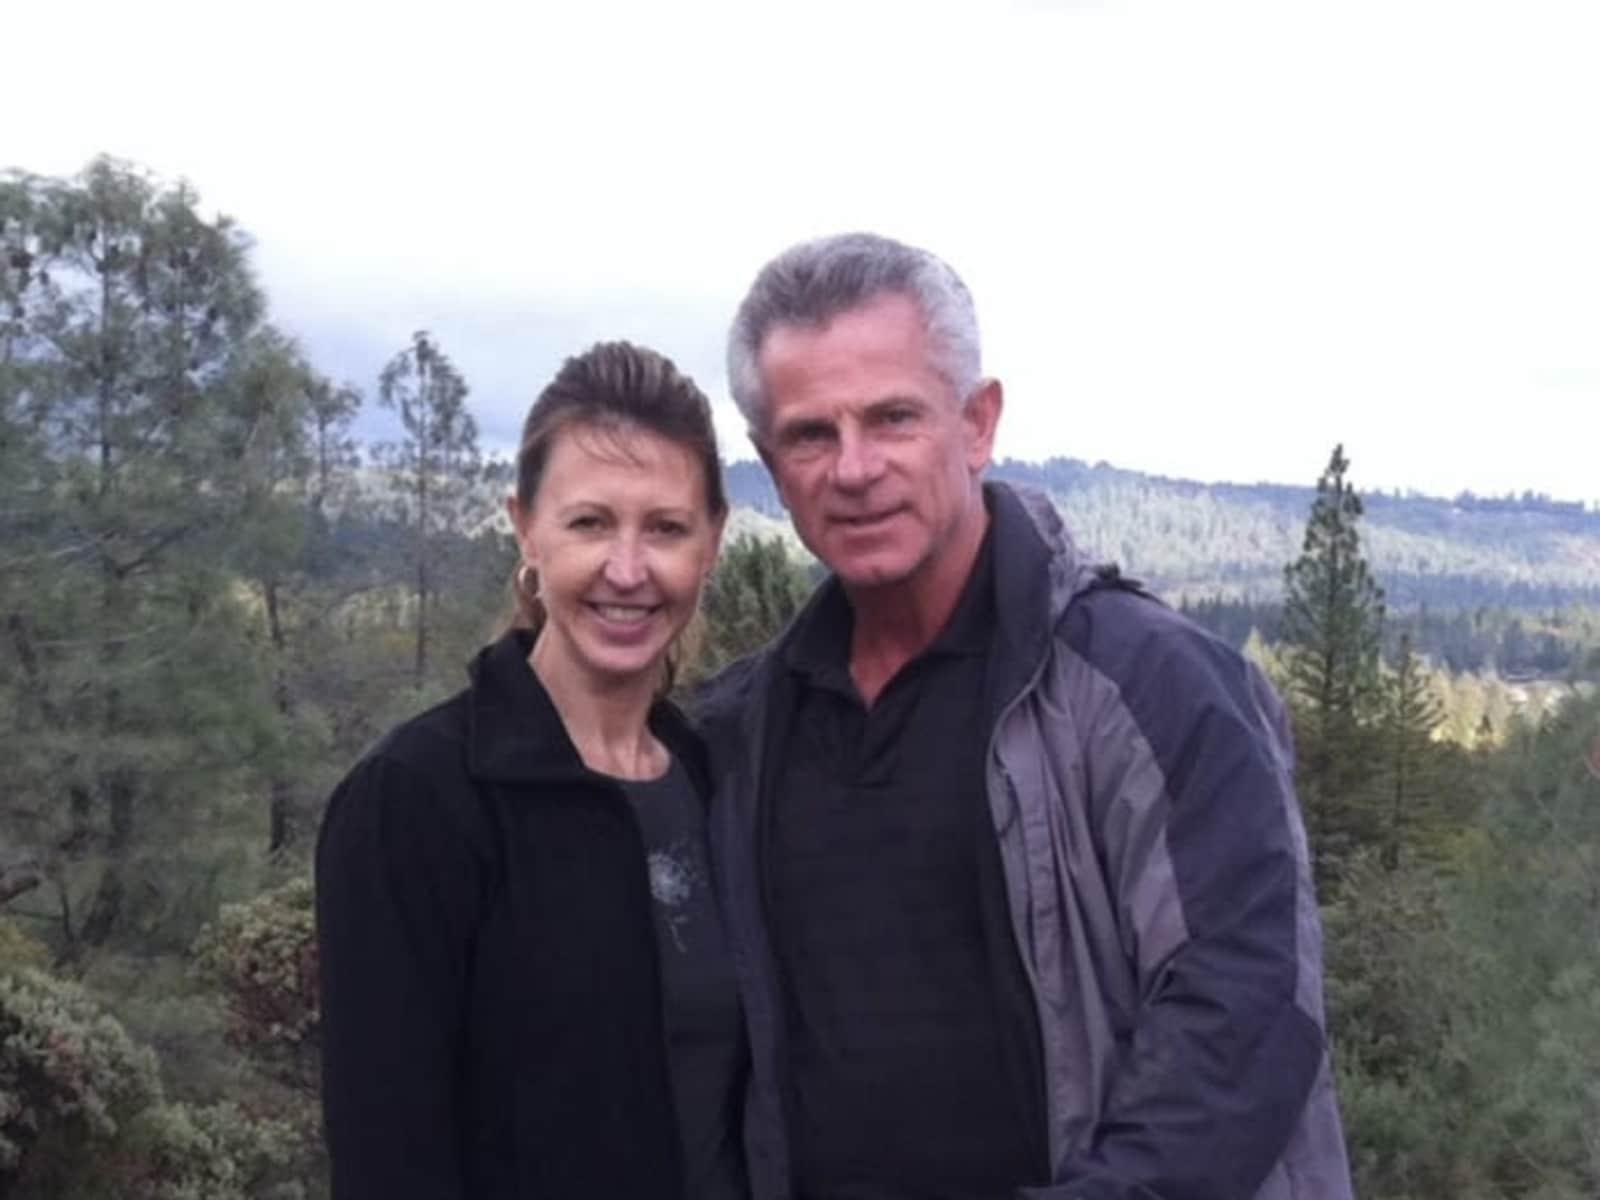 Tanya & David from Sacramento, California, United States